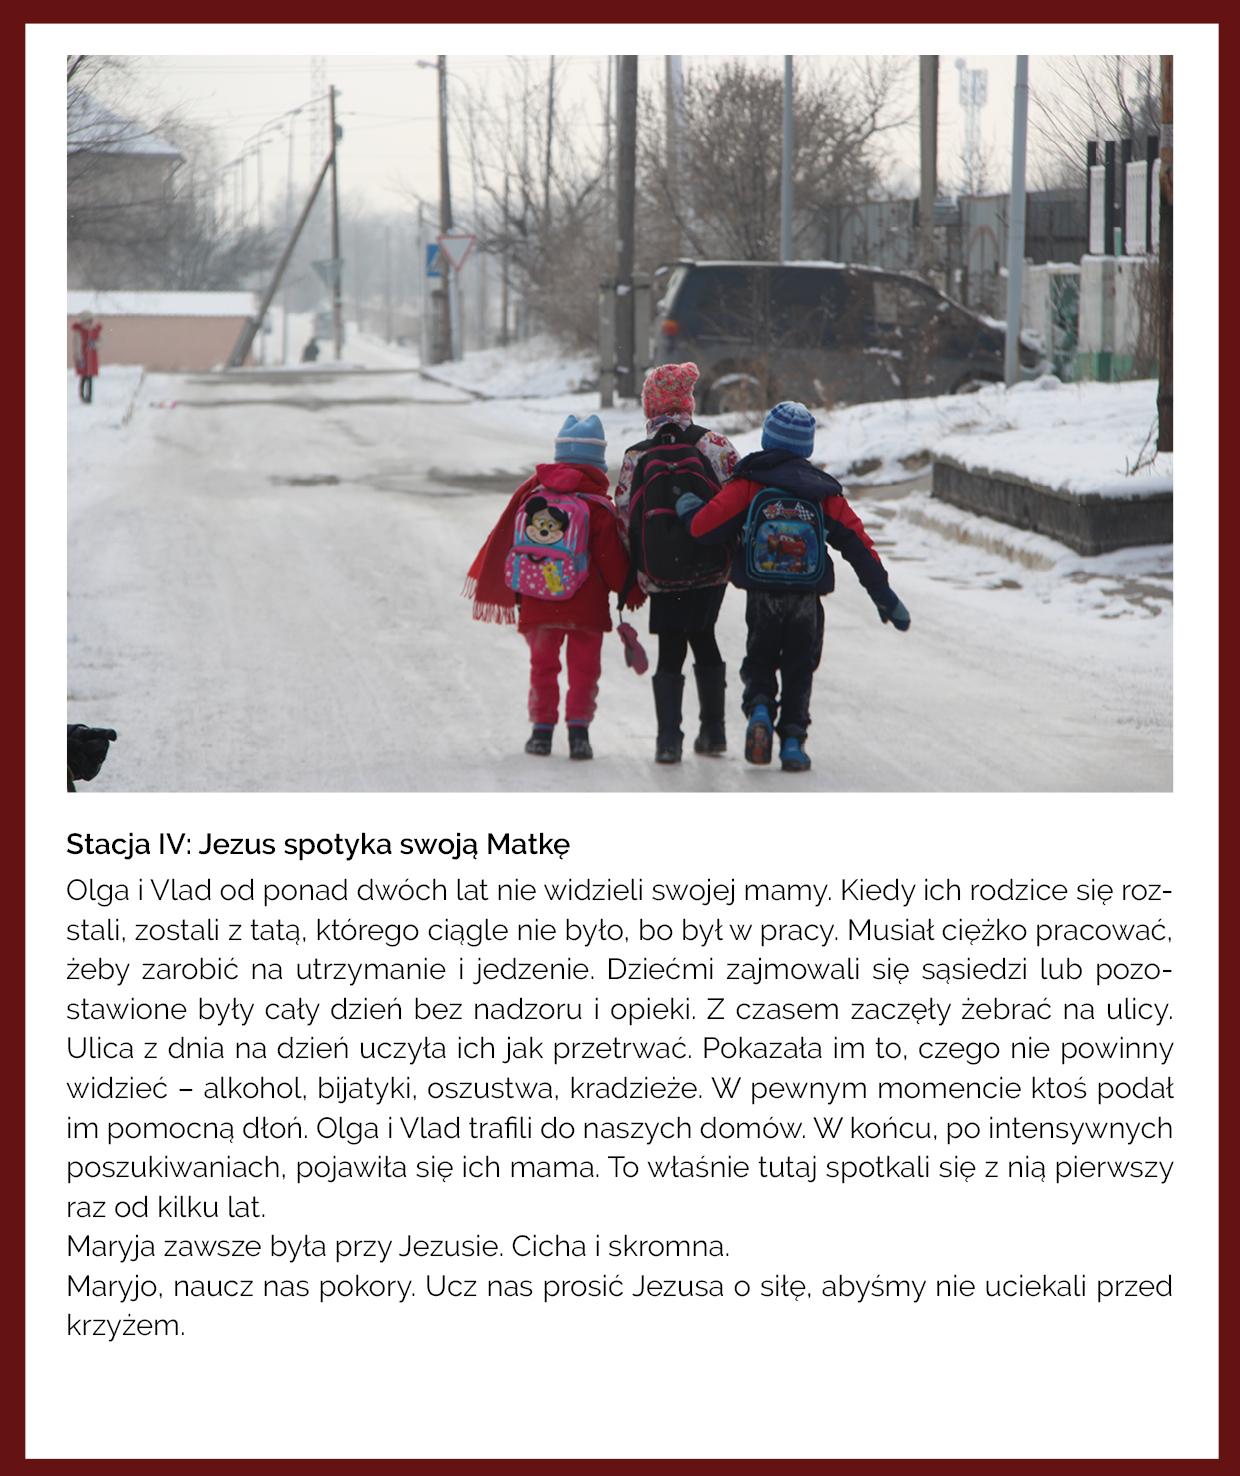 MISJA POST - DROGA KRZYŻOWA - KAZACHSTAN